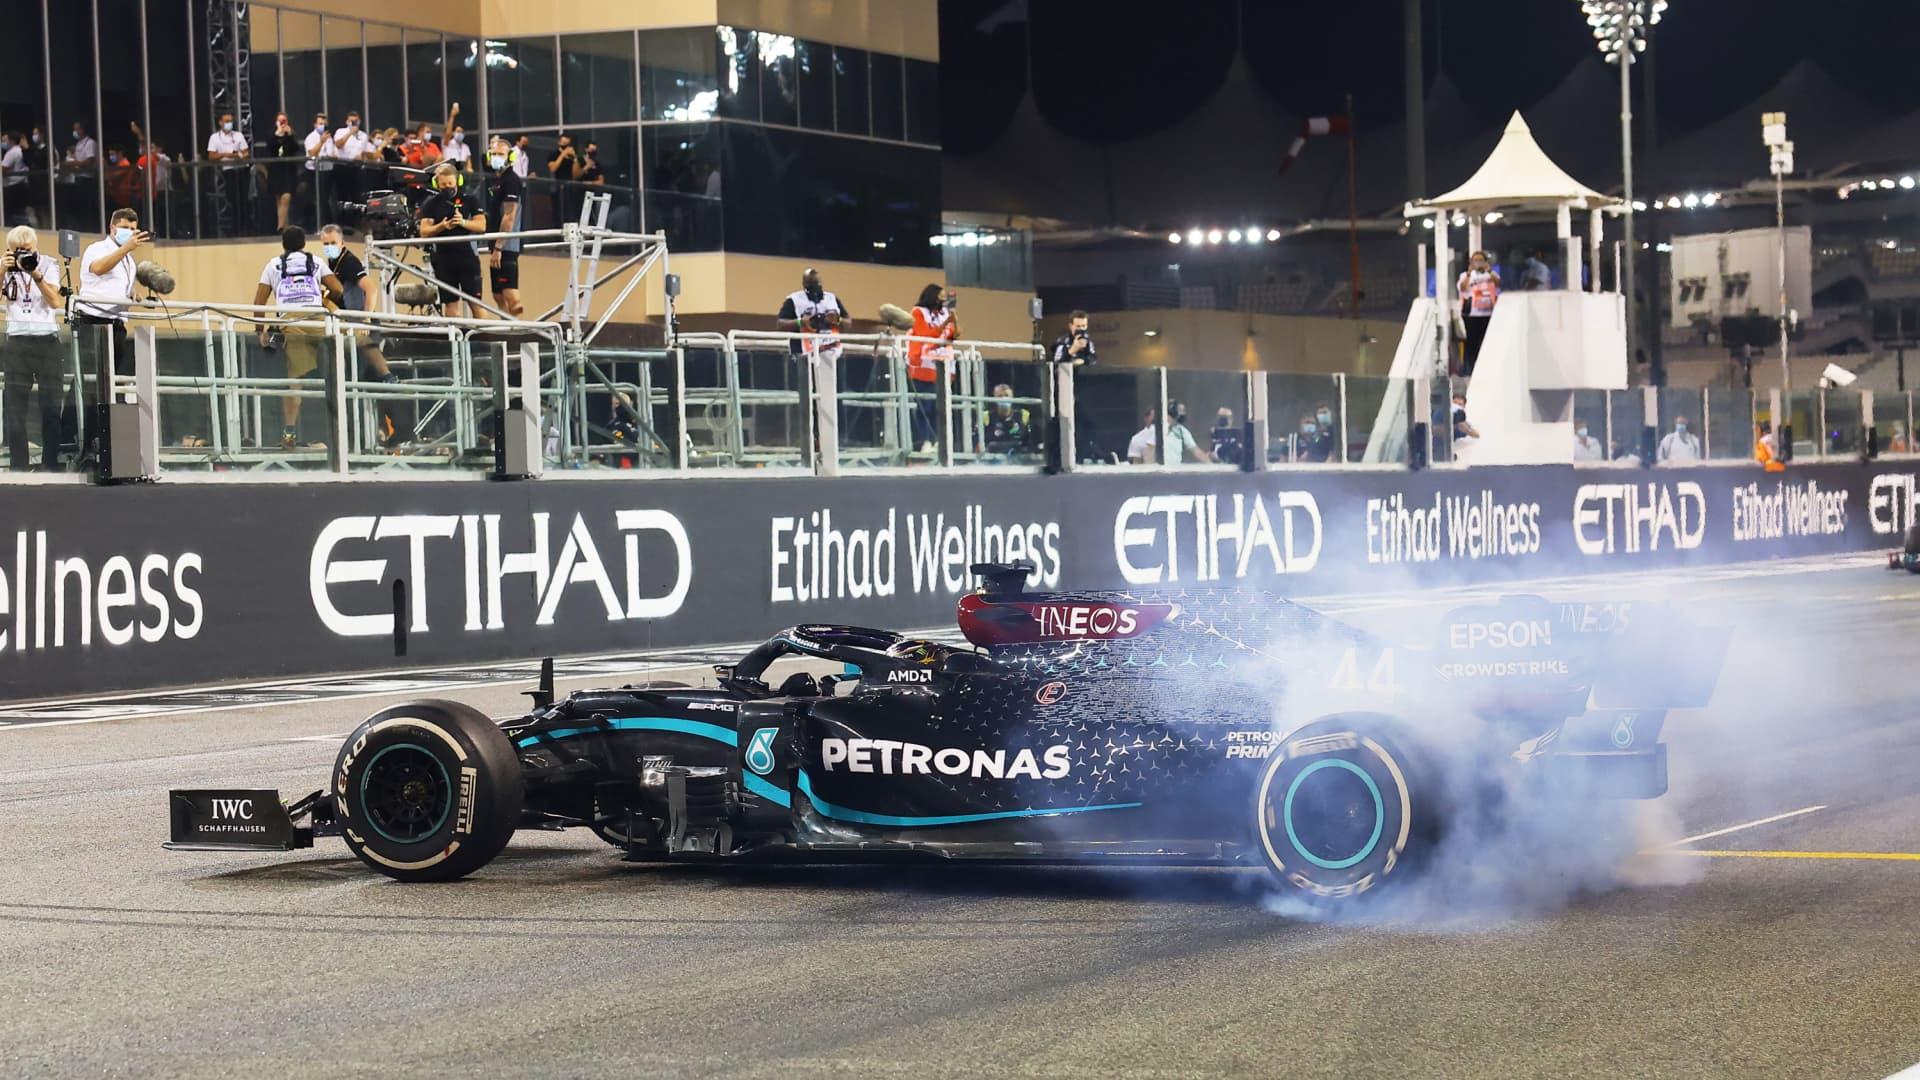 Abu Dhabi Grand Prix in Abu Dhabi, United Arab Emirates, December 13, 2020.